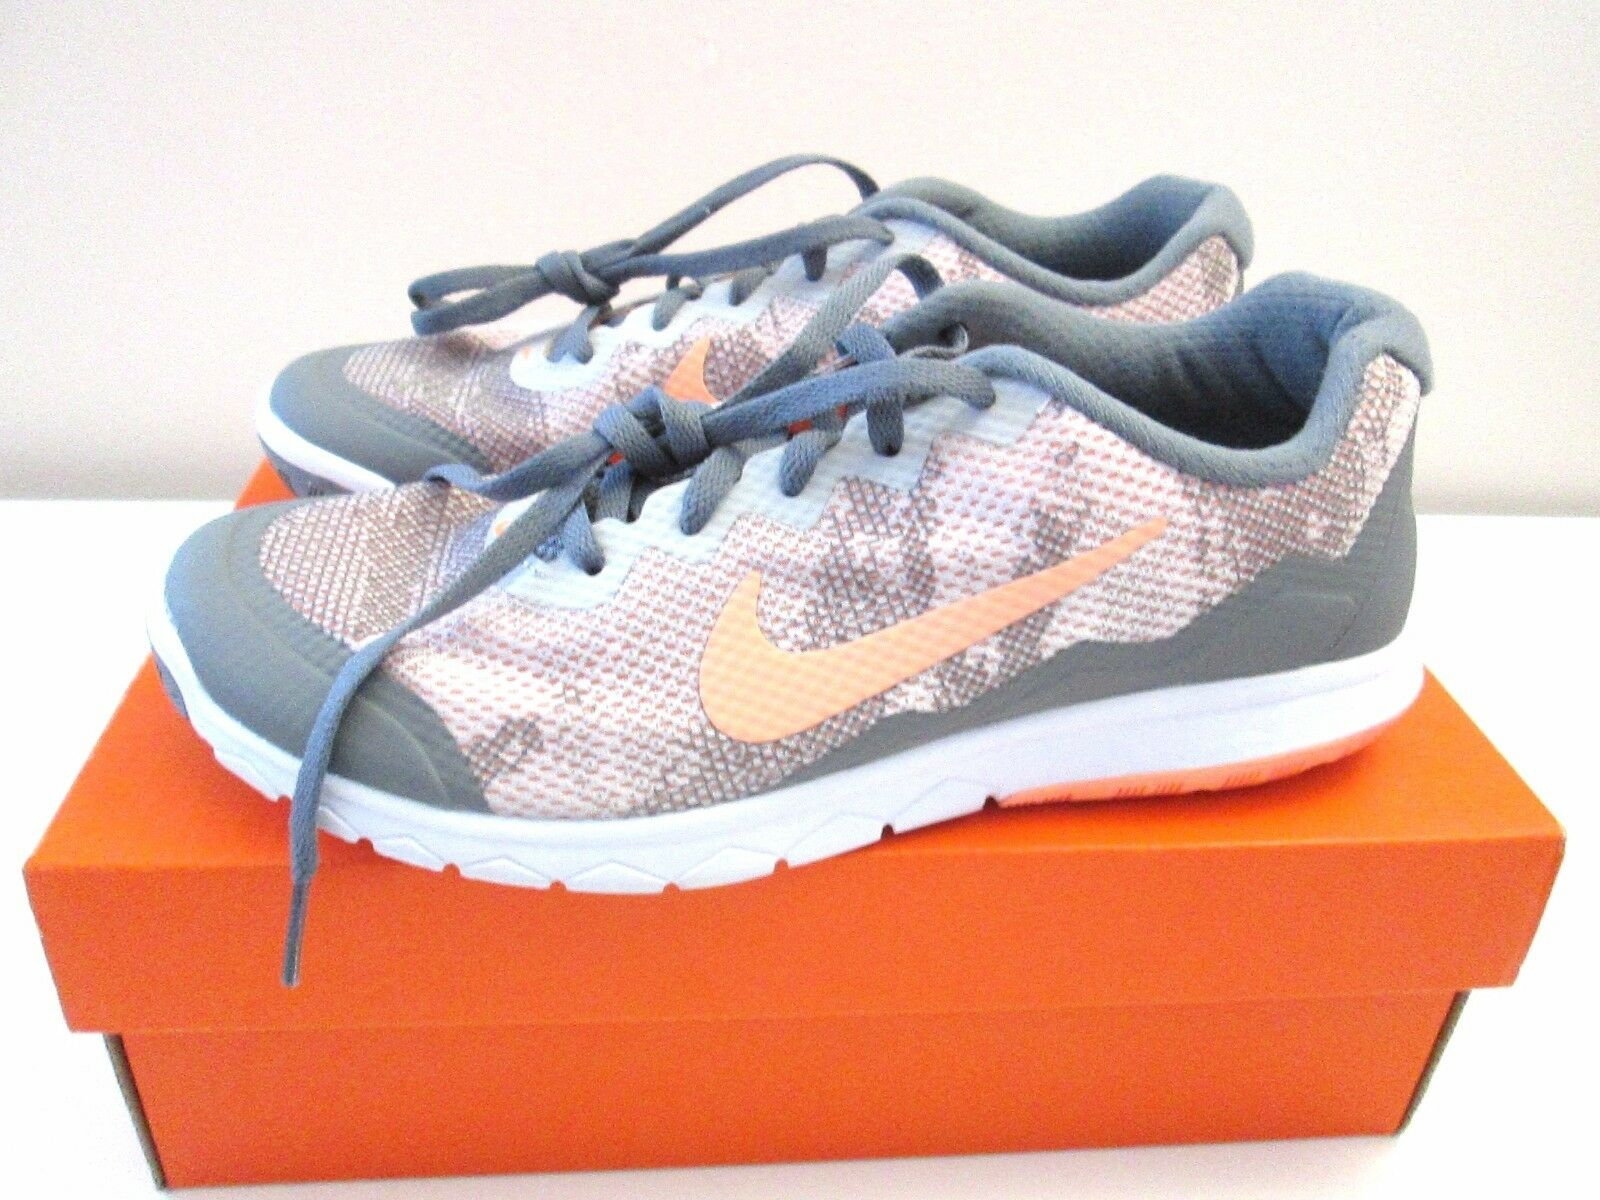 NIKE Womens Flex RN 4 Prem athletic sneakers gray/pink 749177 001 7 (6.5) NEW!